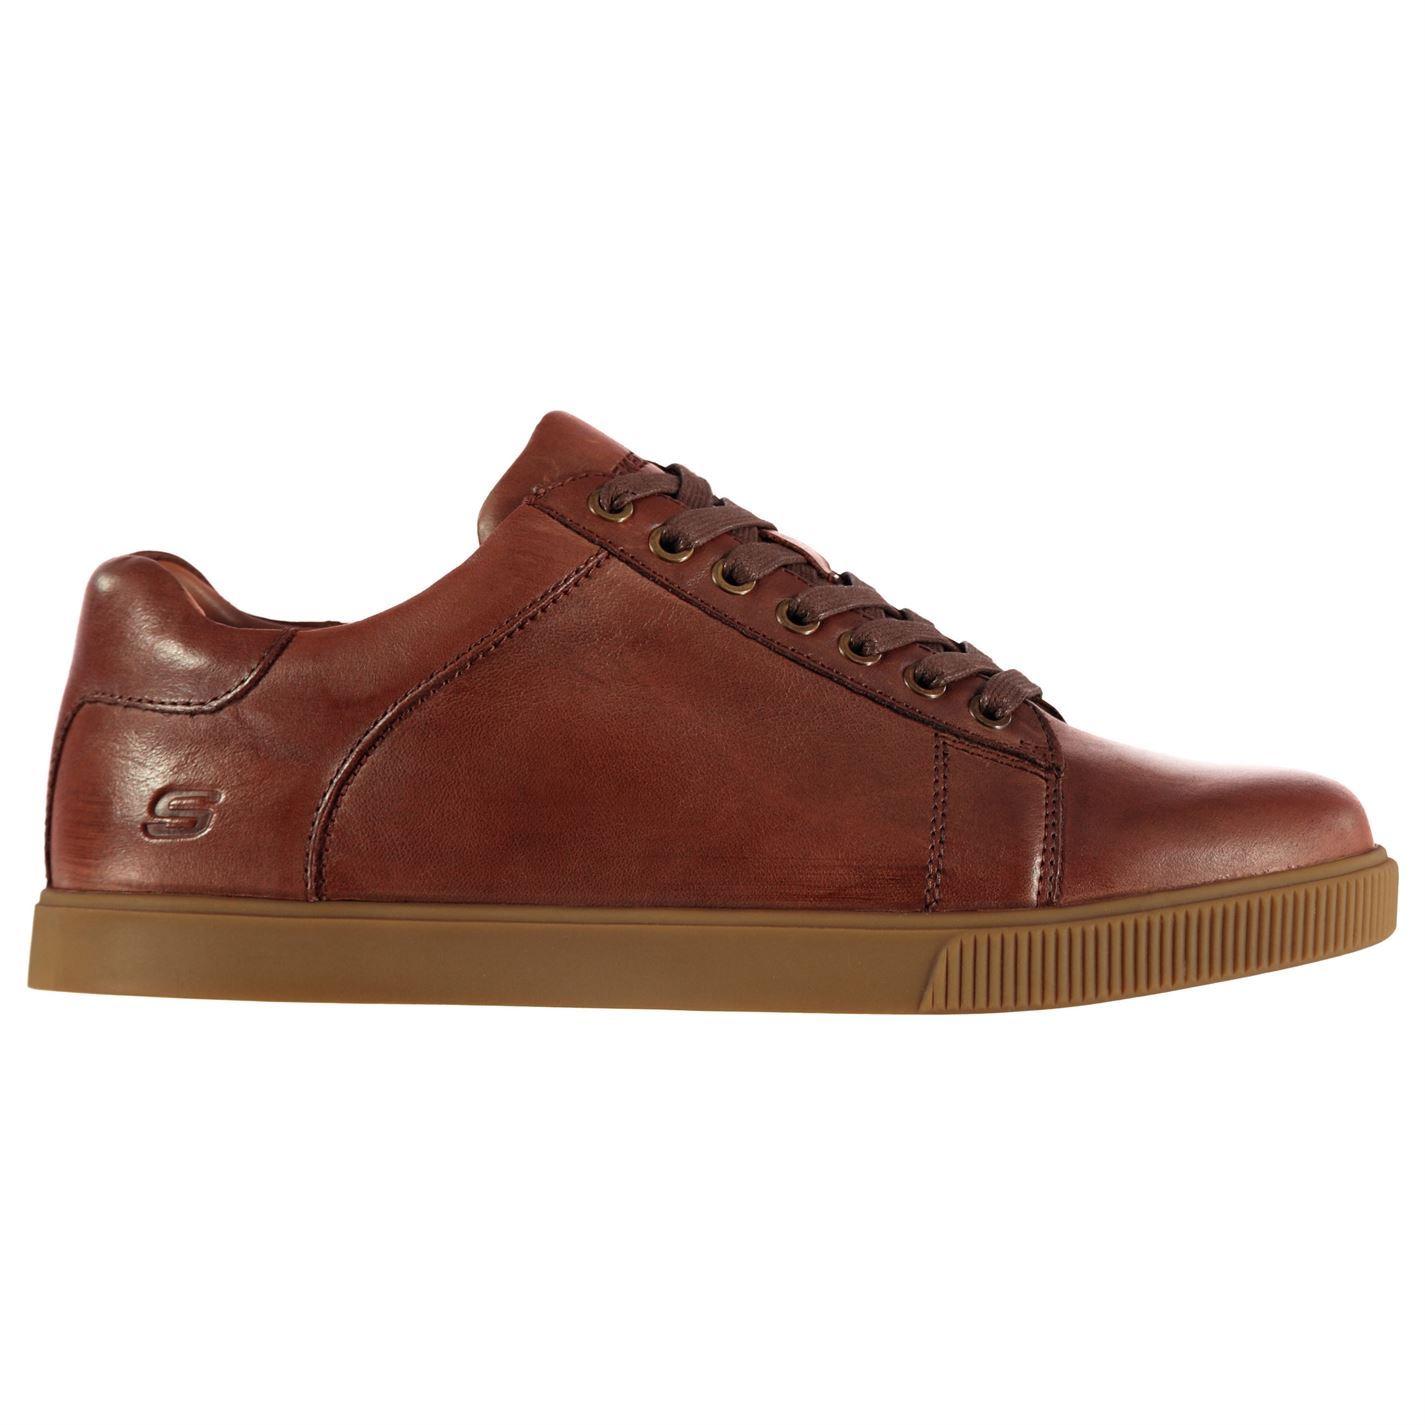 Skechers-Vol-Fandom-Homme-Chaussures-Baskets-decontractees-chaussures-baskets miniature 11